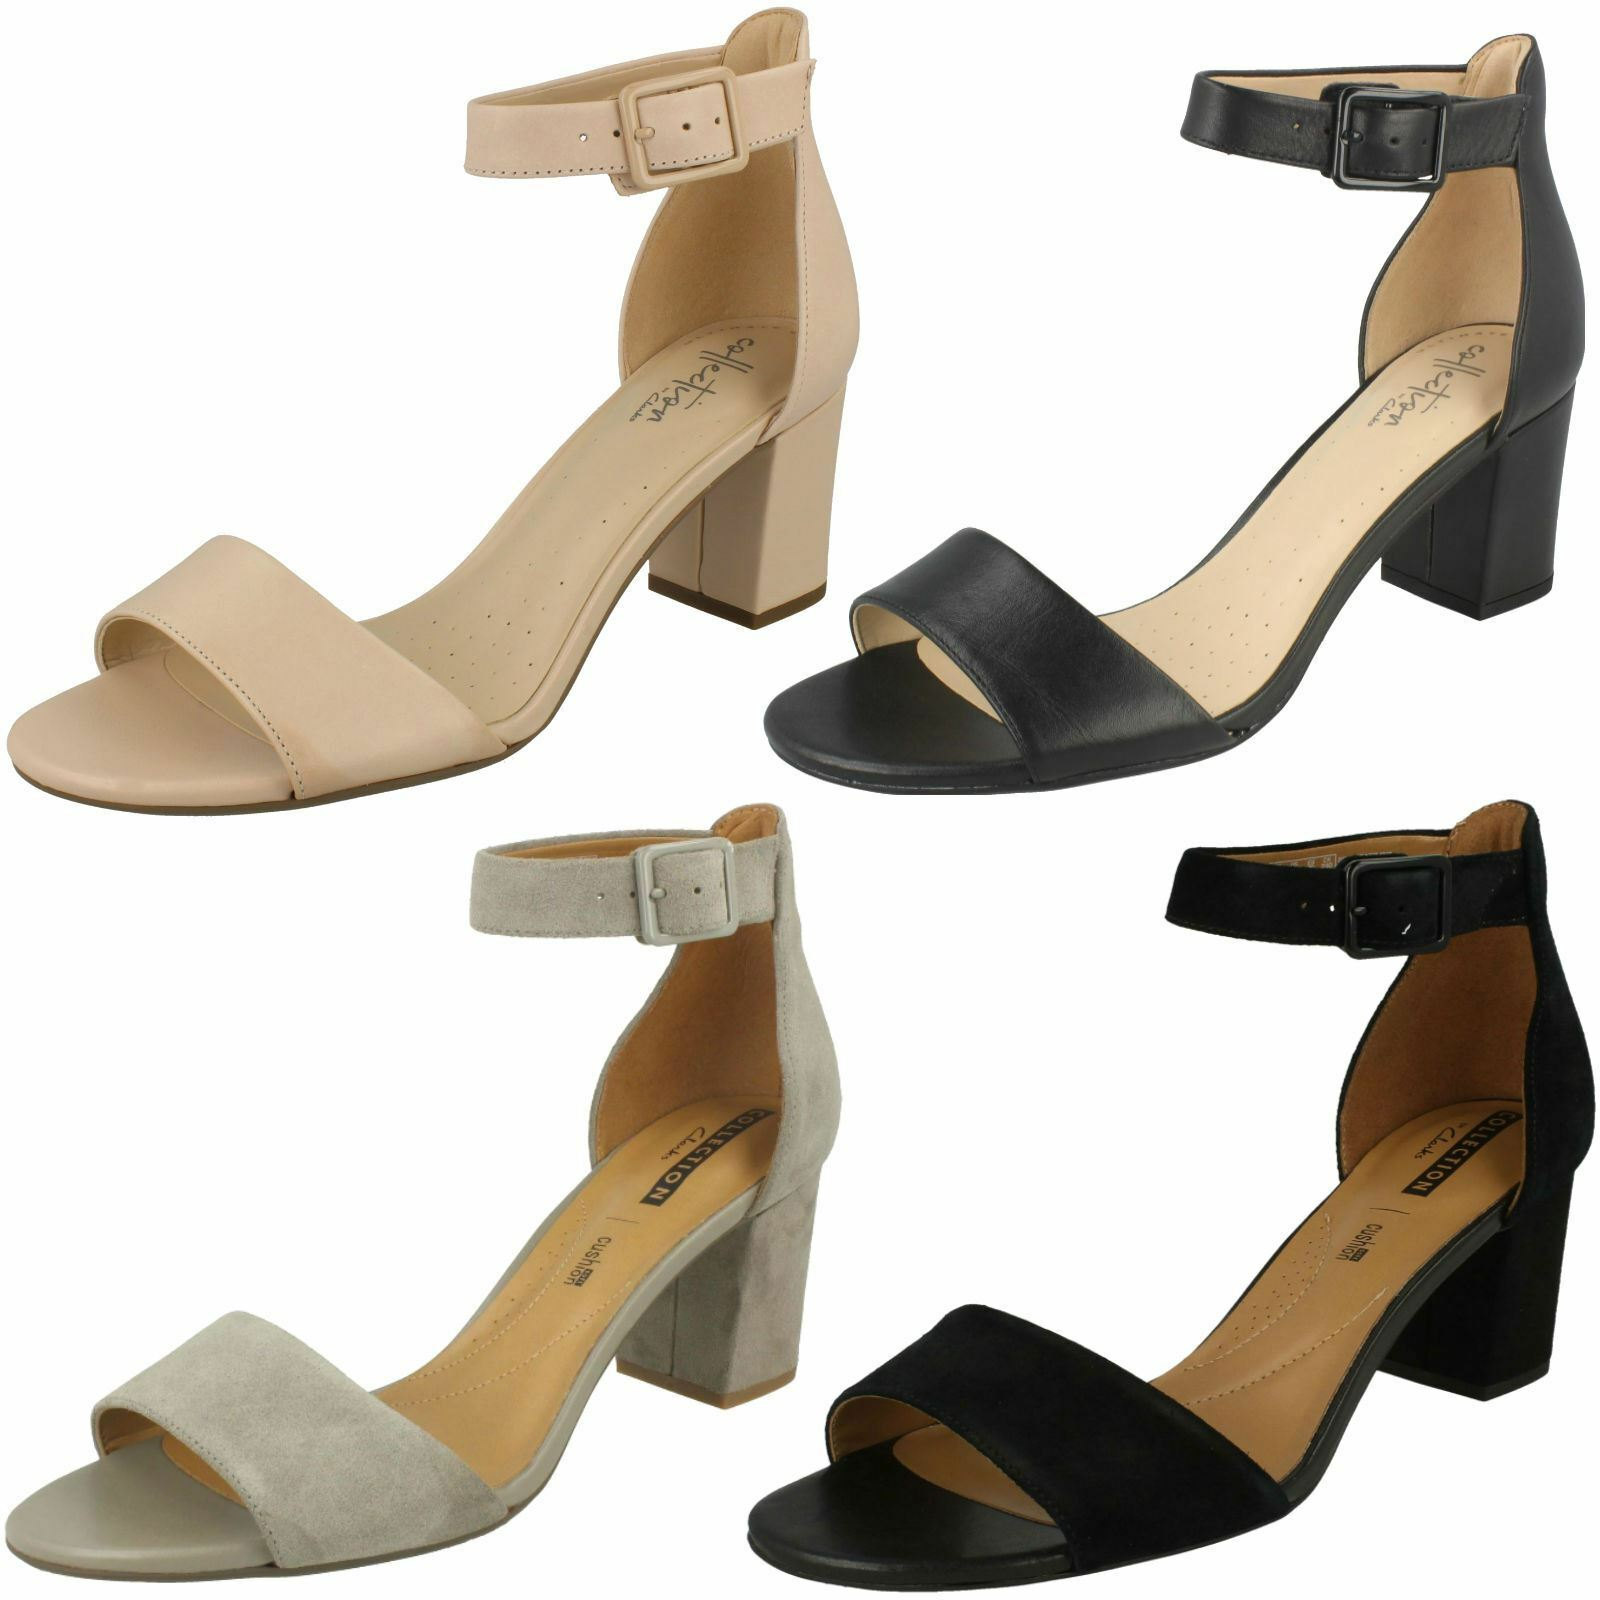 Ladies Clarks Heeled Sandals - Deva Mae